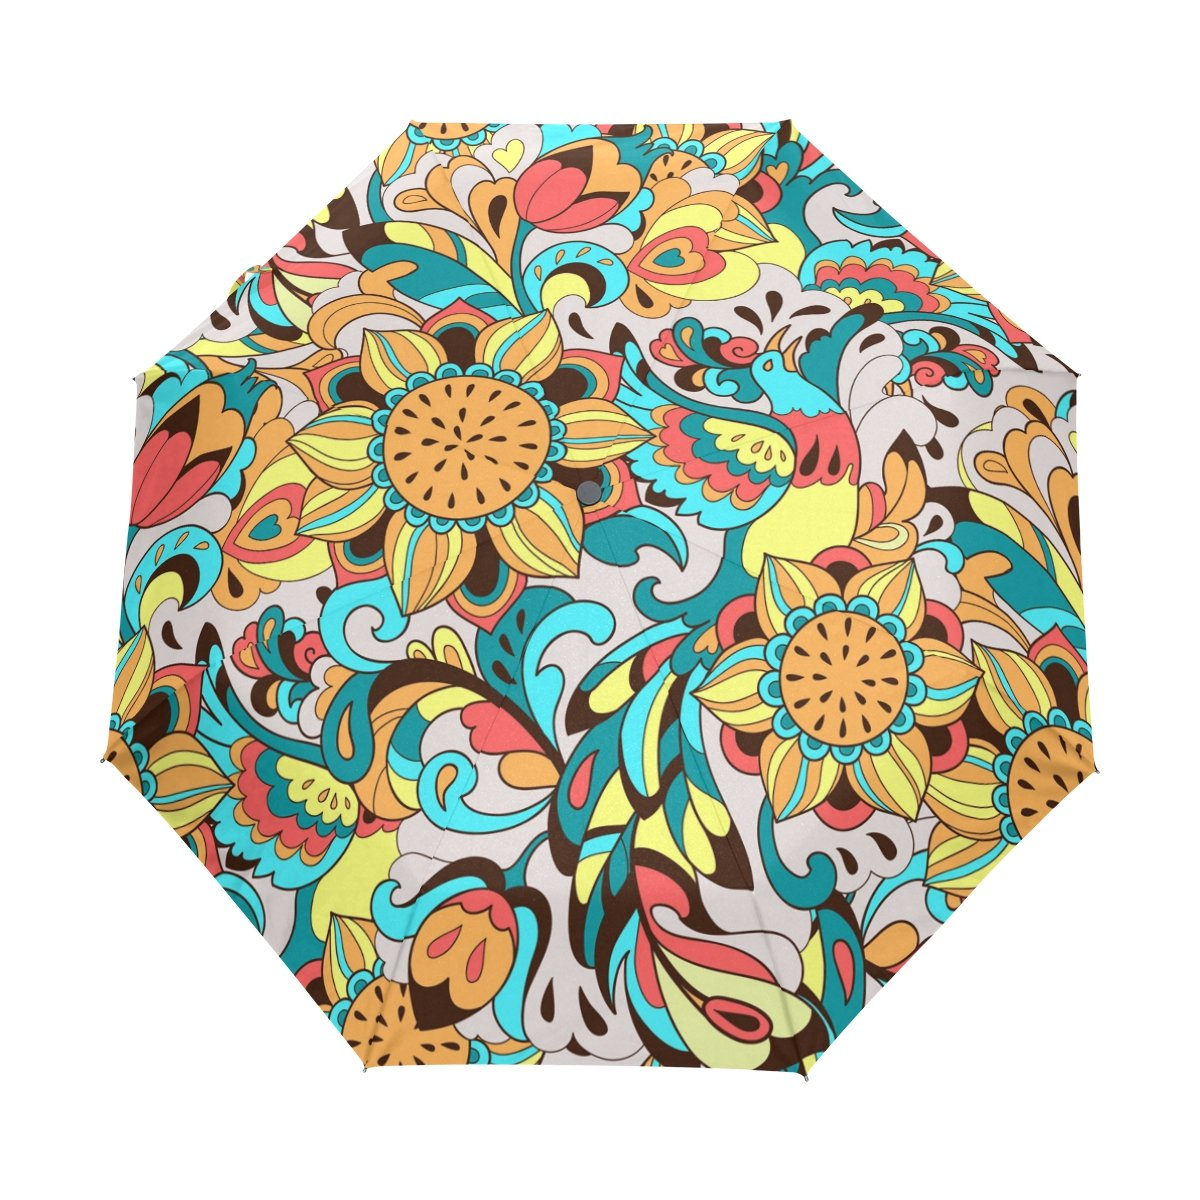 deyya Sunbird花自動3折りたたみパラソルSun保護紫外線対策傘の女性 B0757R92HV